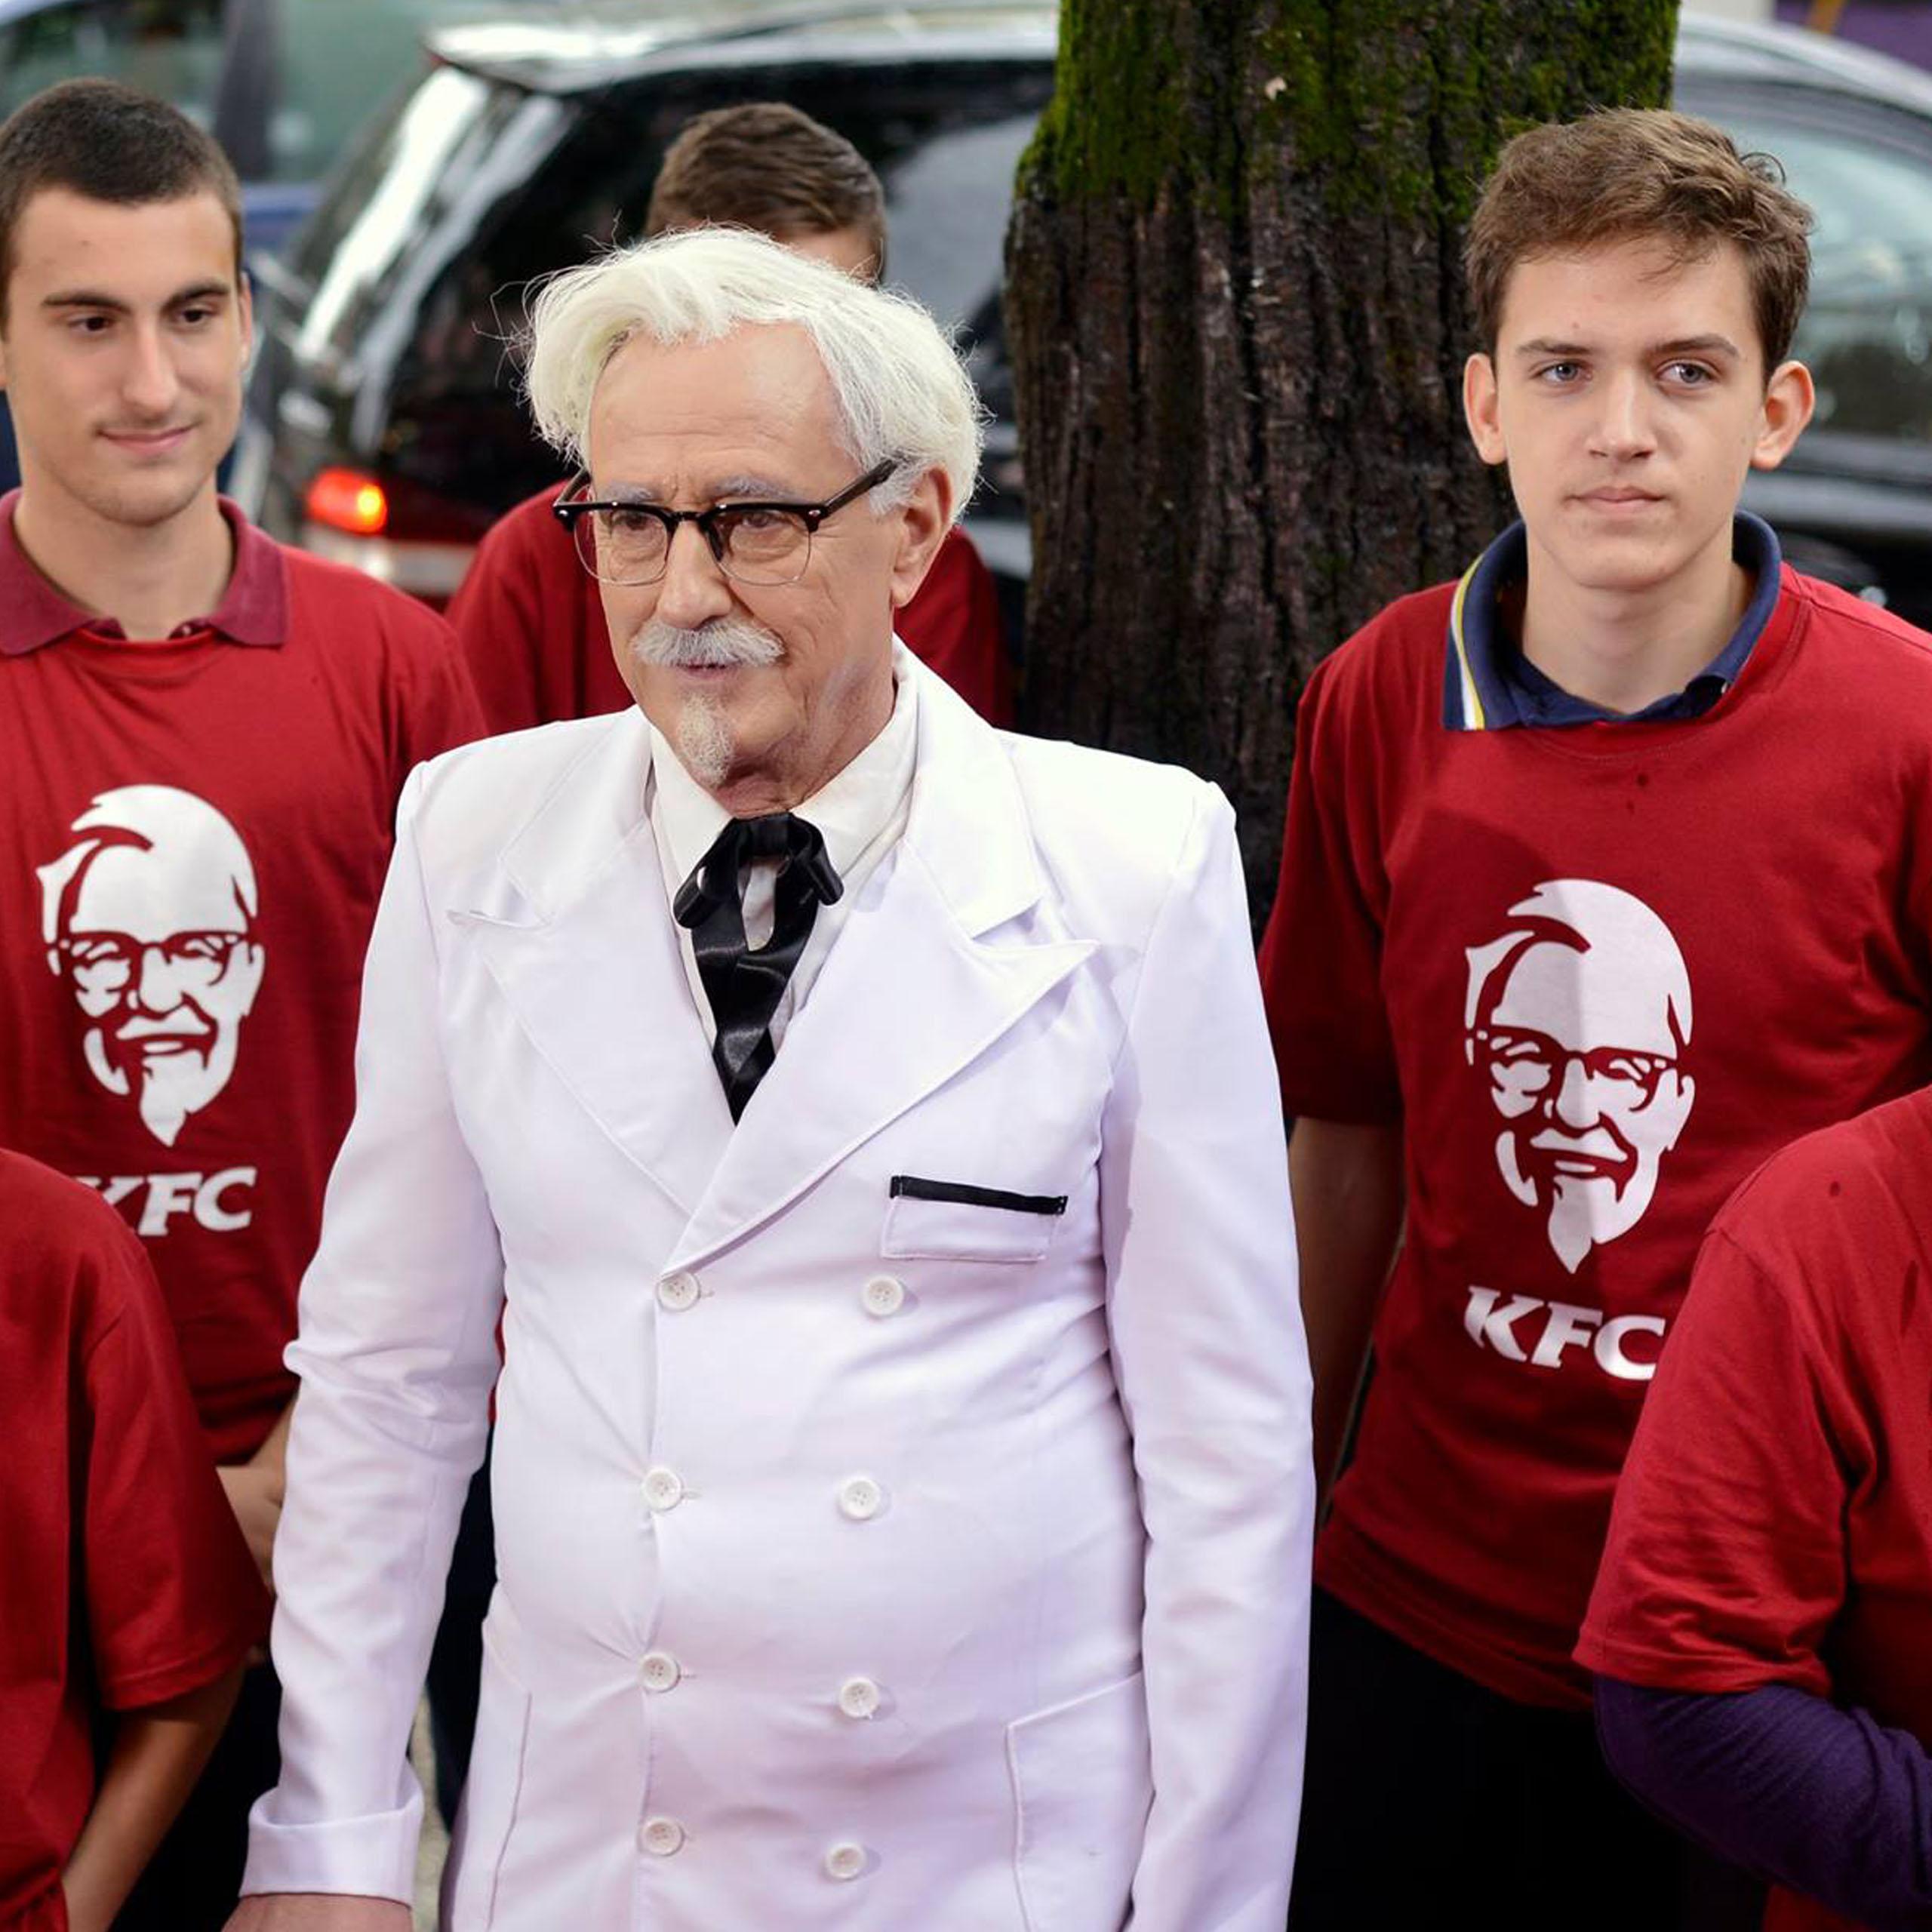 KFC Albania, Project Img 4 - Vatra Agency / Founder & CEO Gerton Bejo